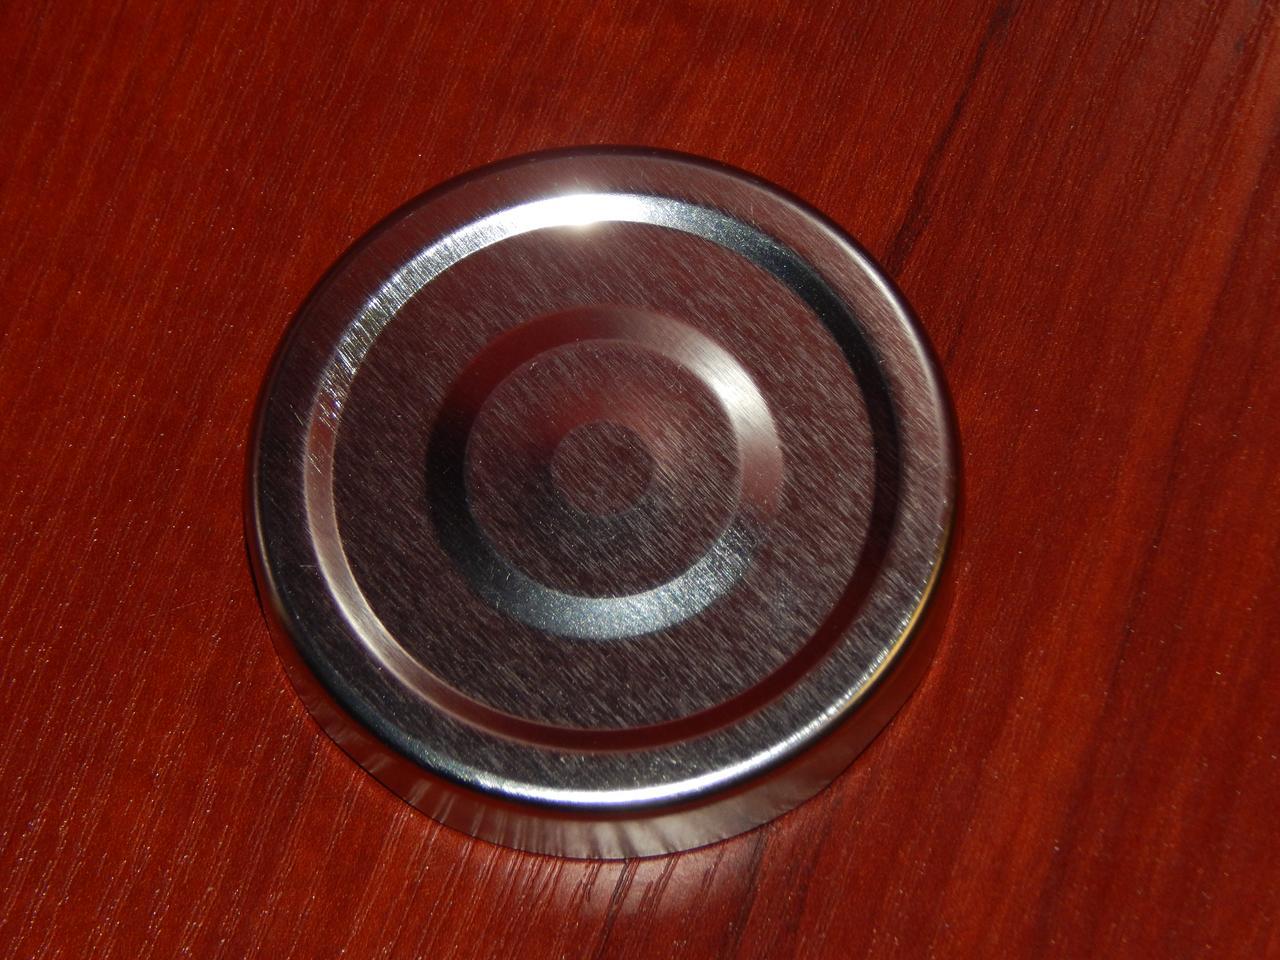 Крышка закаточная твист-офф размер 63 мм Deep серебро (высота 15 мм) кнопка